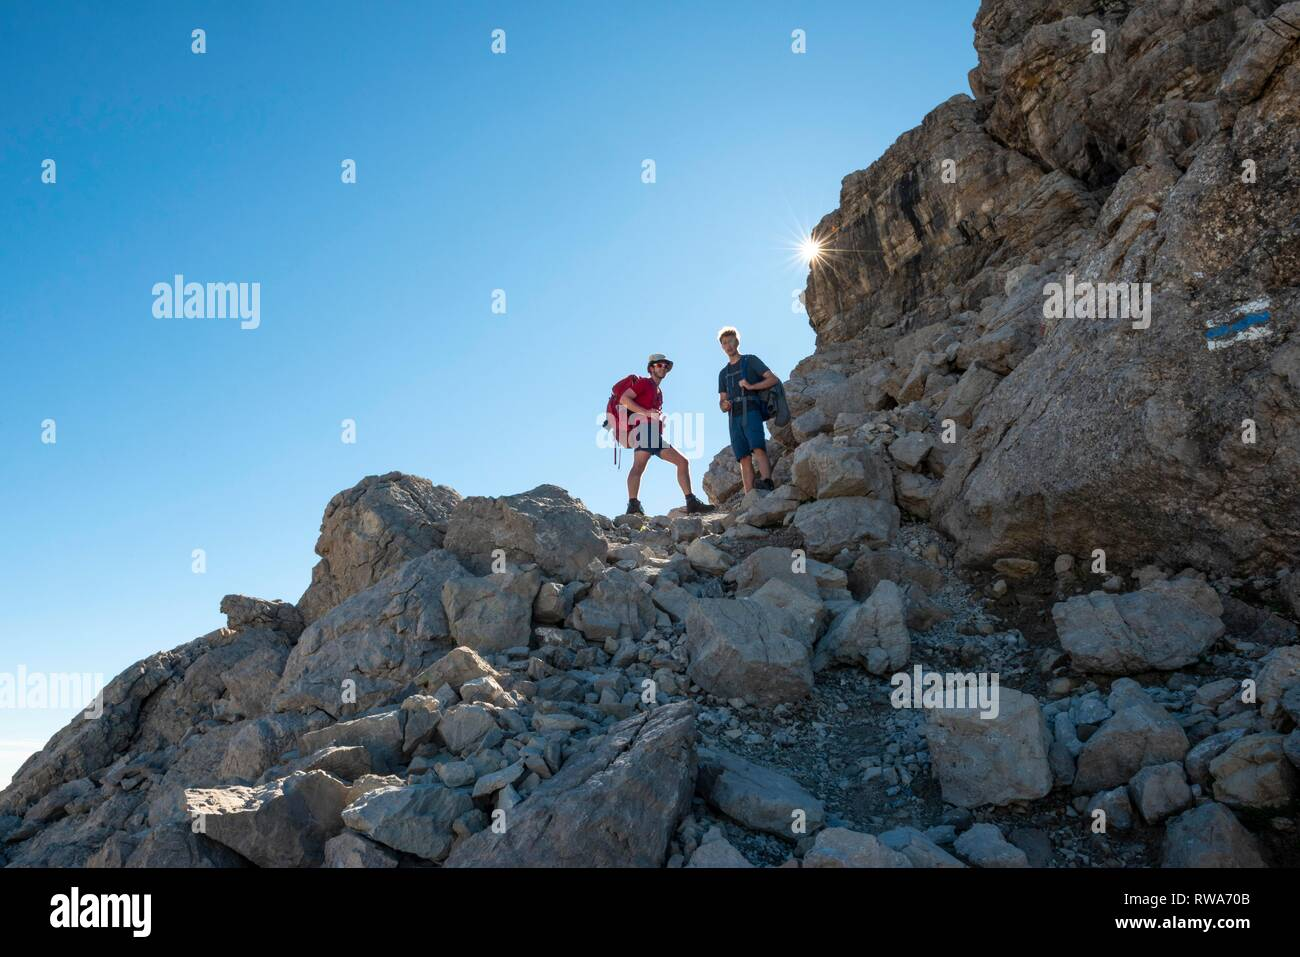 Two hikers ascending to the Hochvogel, Sonnenstrahlen, Allgäu, Allgäuer Hochalpen, Bavaria, Germany - Stock Image